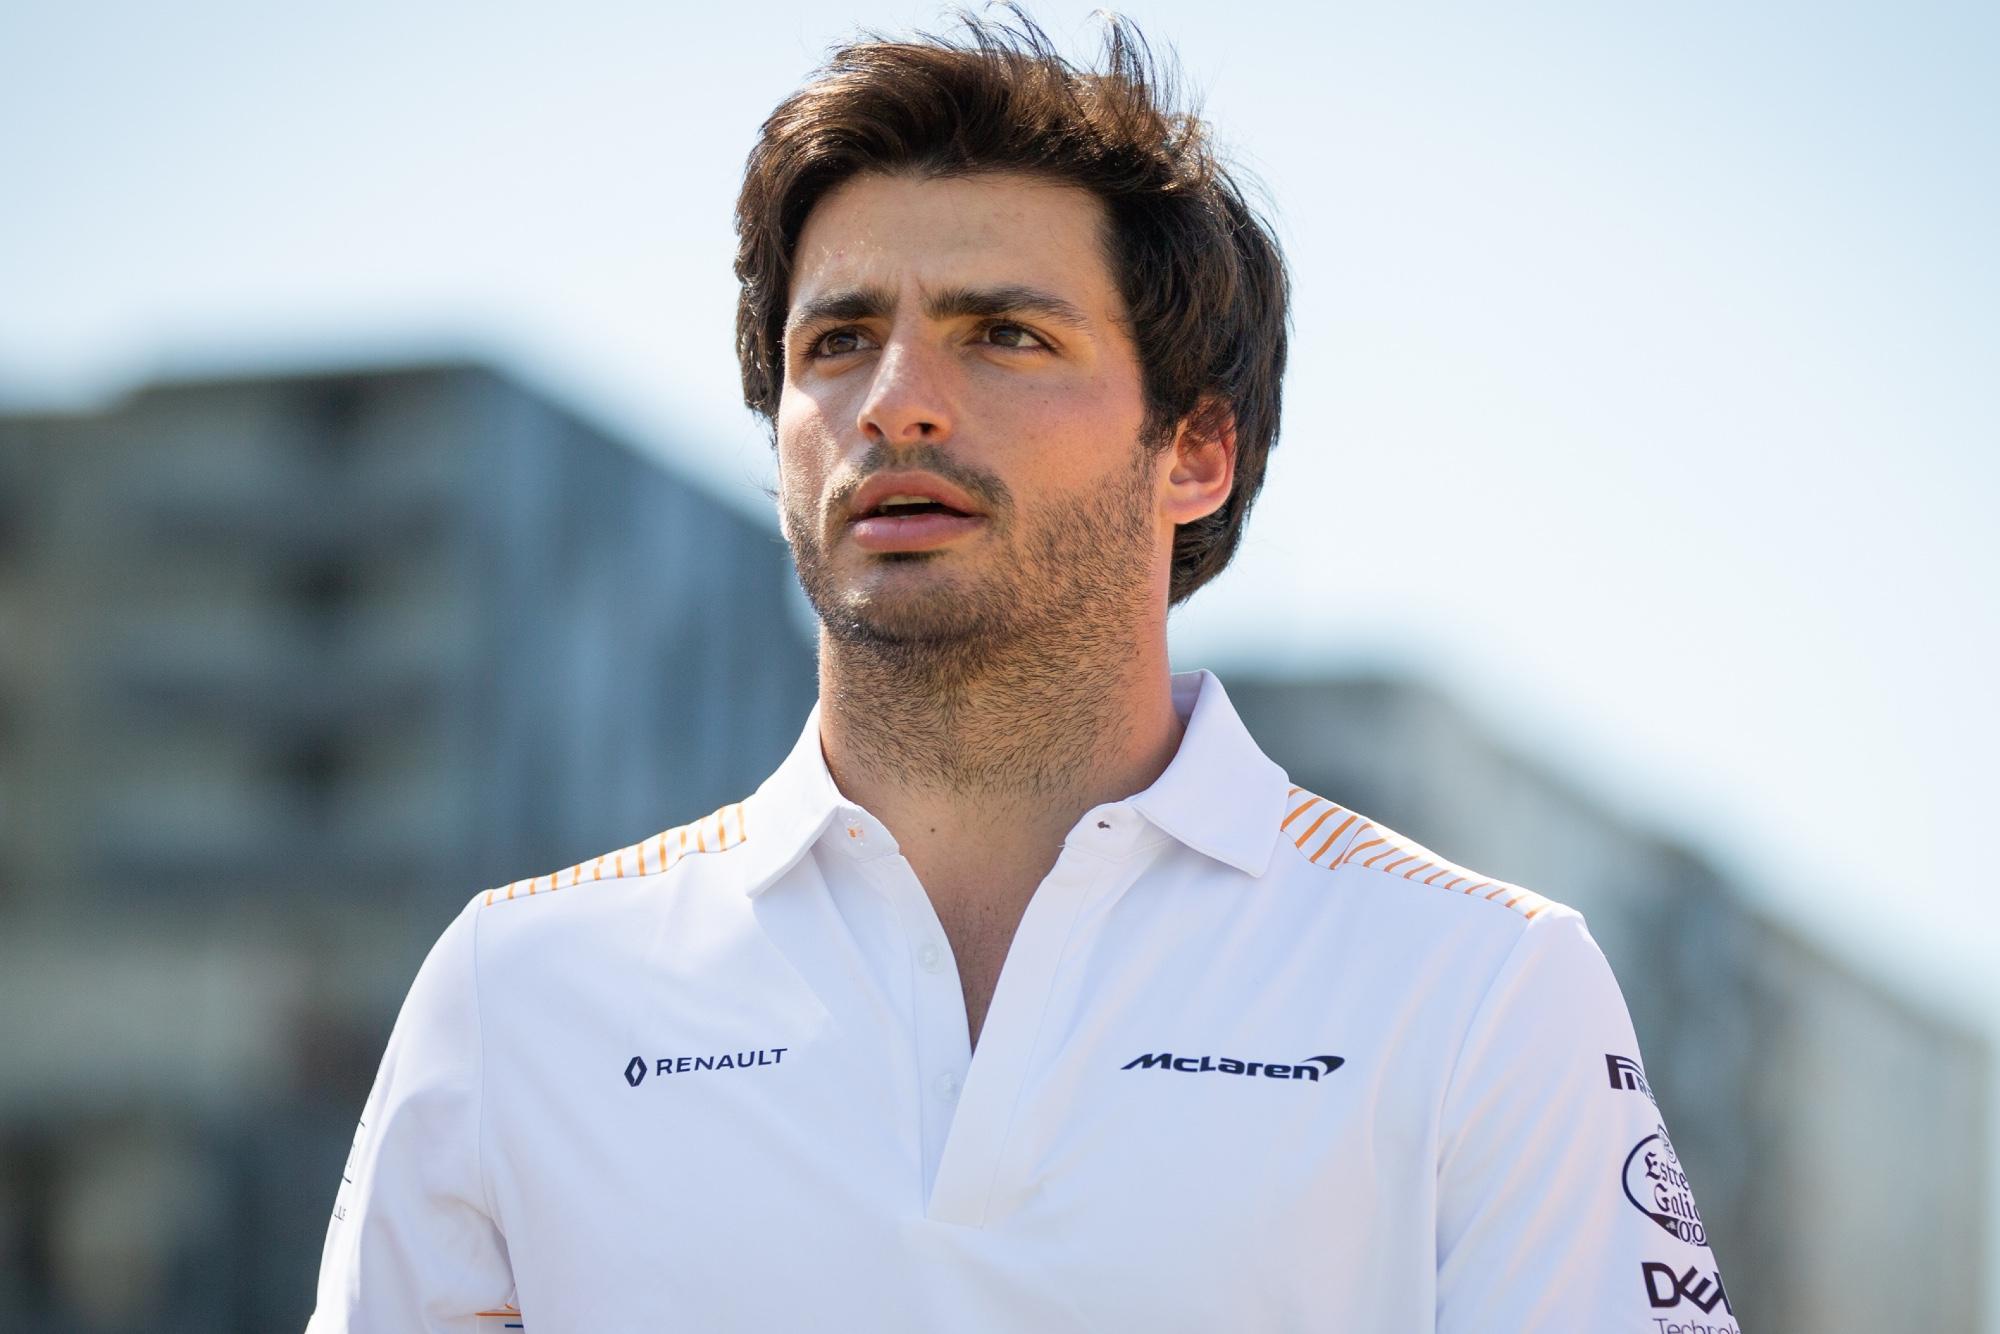 Carlos Sainz, F1 2020 Australian GP